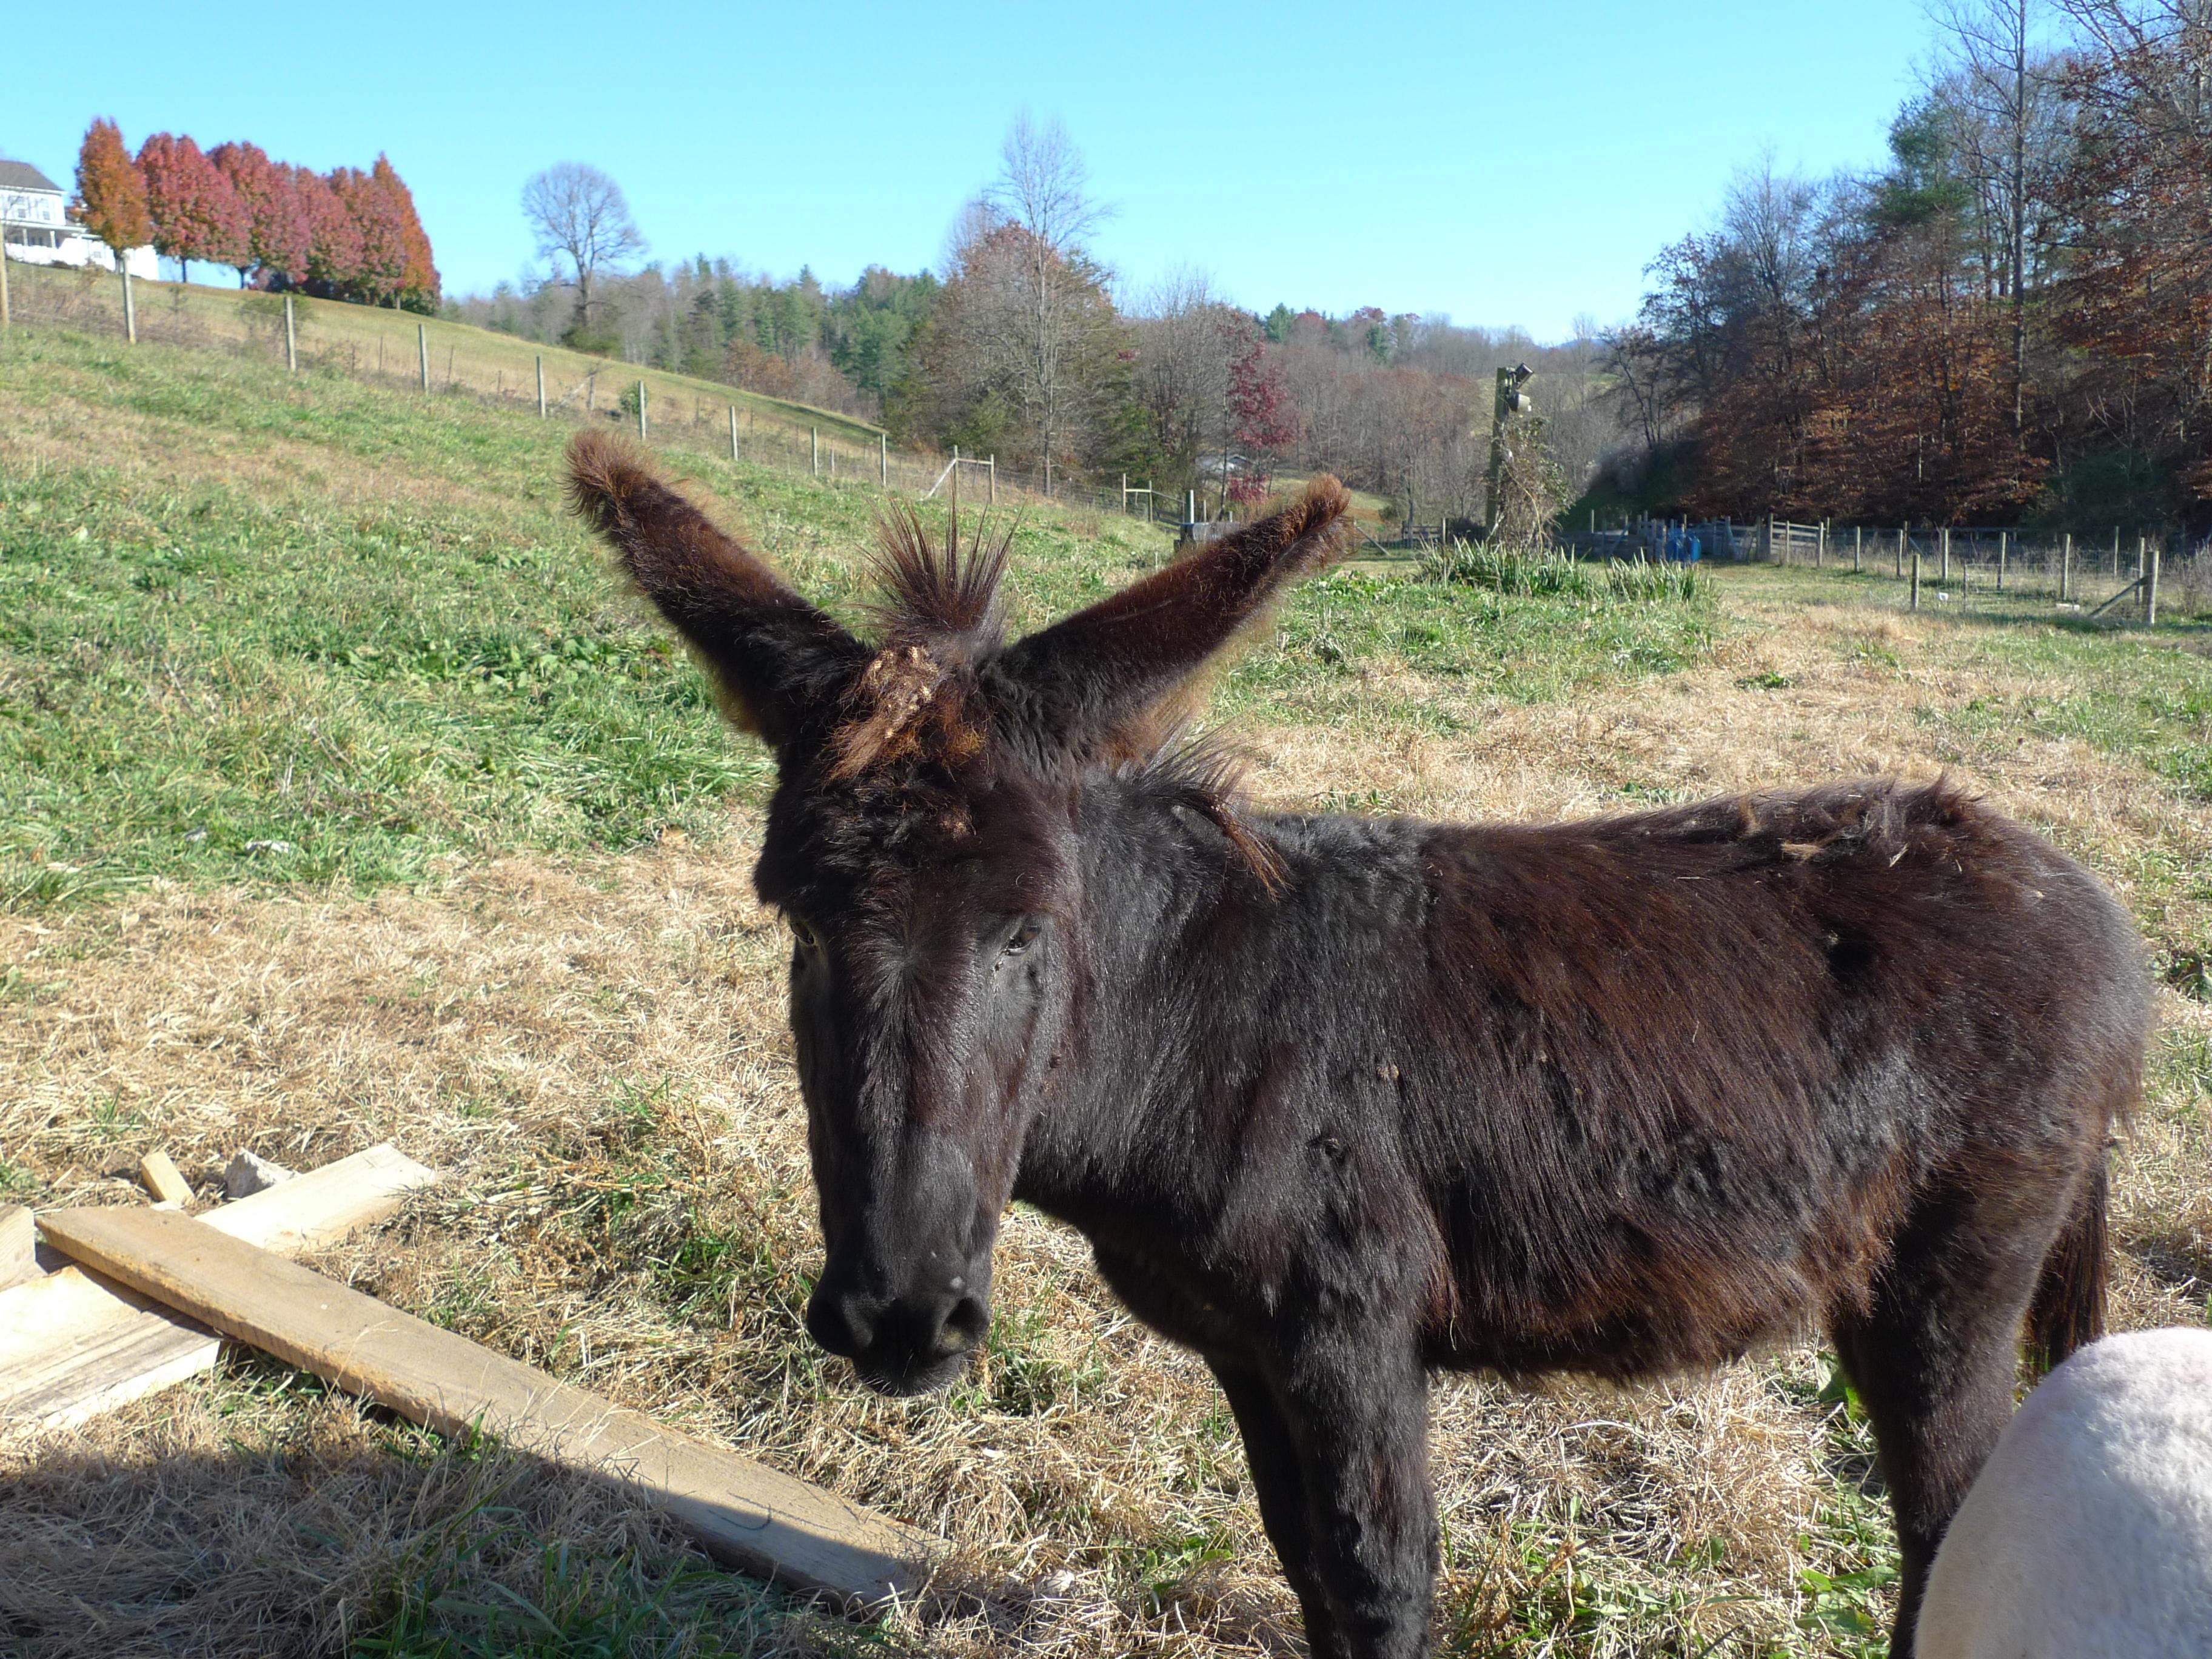 A donkey, a lambing barn, and pork! (Oh My!) | Dry Ridge Farm